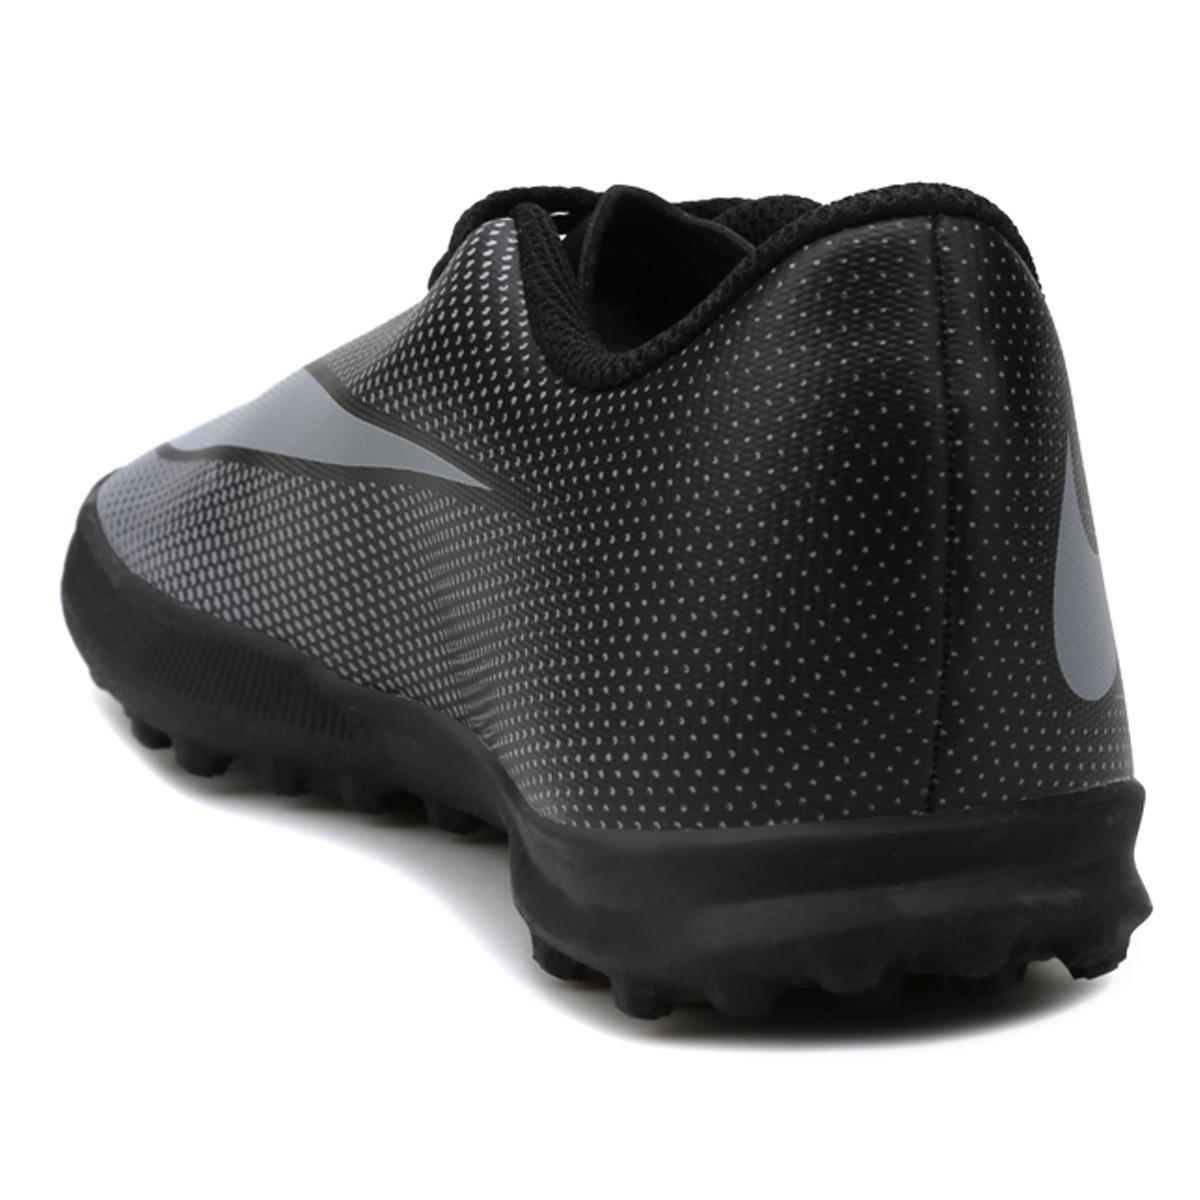 ff107cd831 Chuteira Society Infantil Nike Bravata 2 TF - Compre Agora